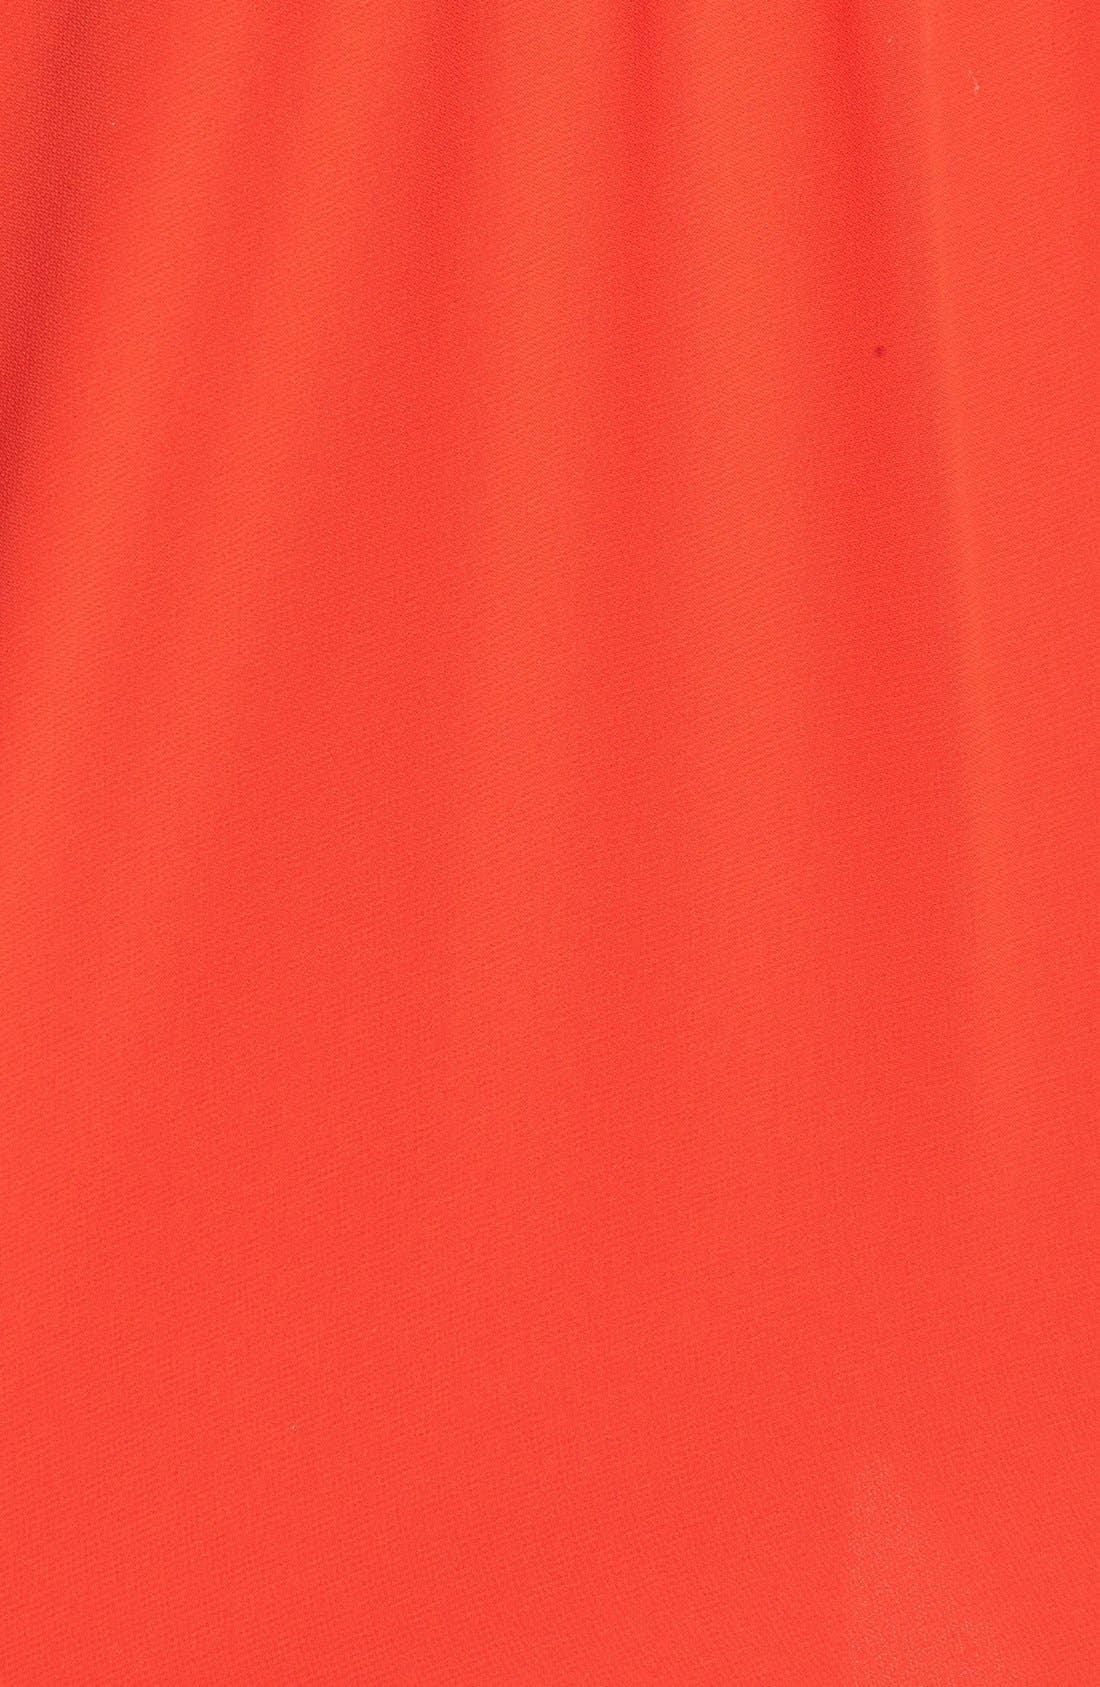 Blouson Chiffon Skater Dress,                             Alternate thumbnail 146, color,